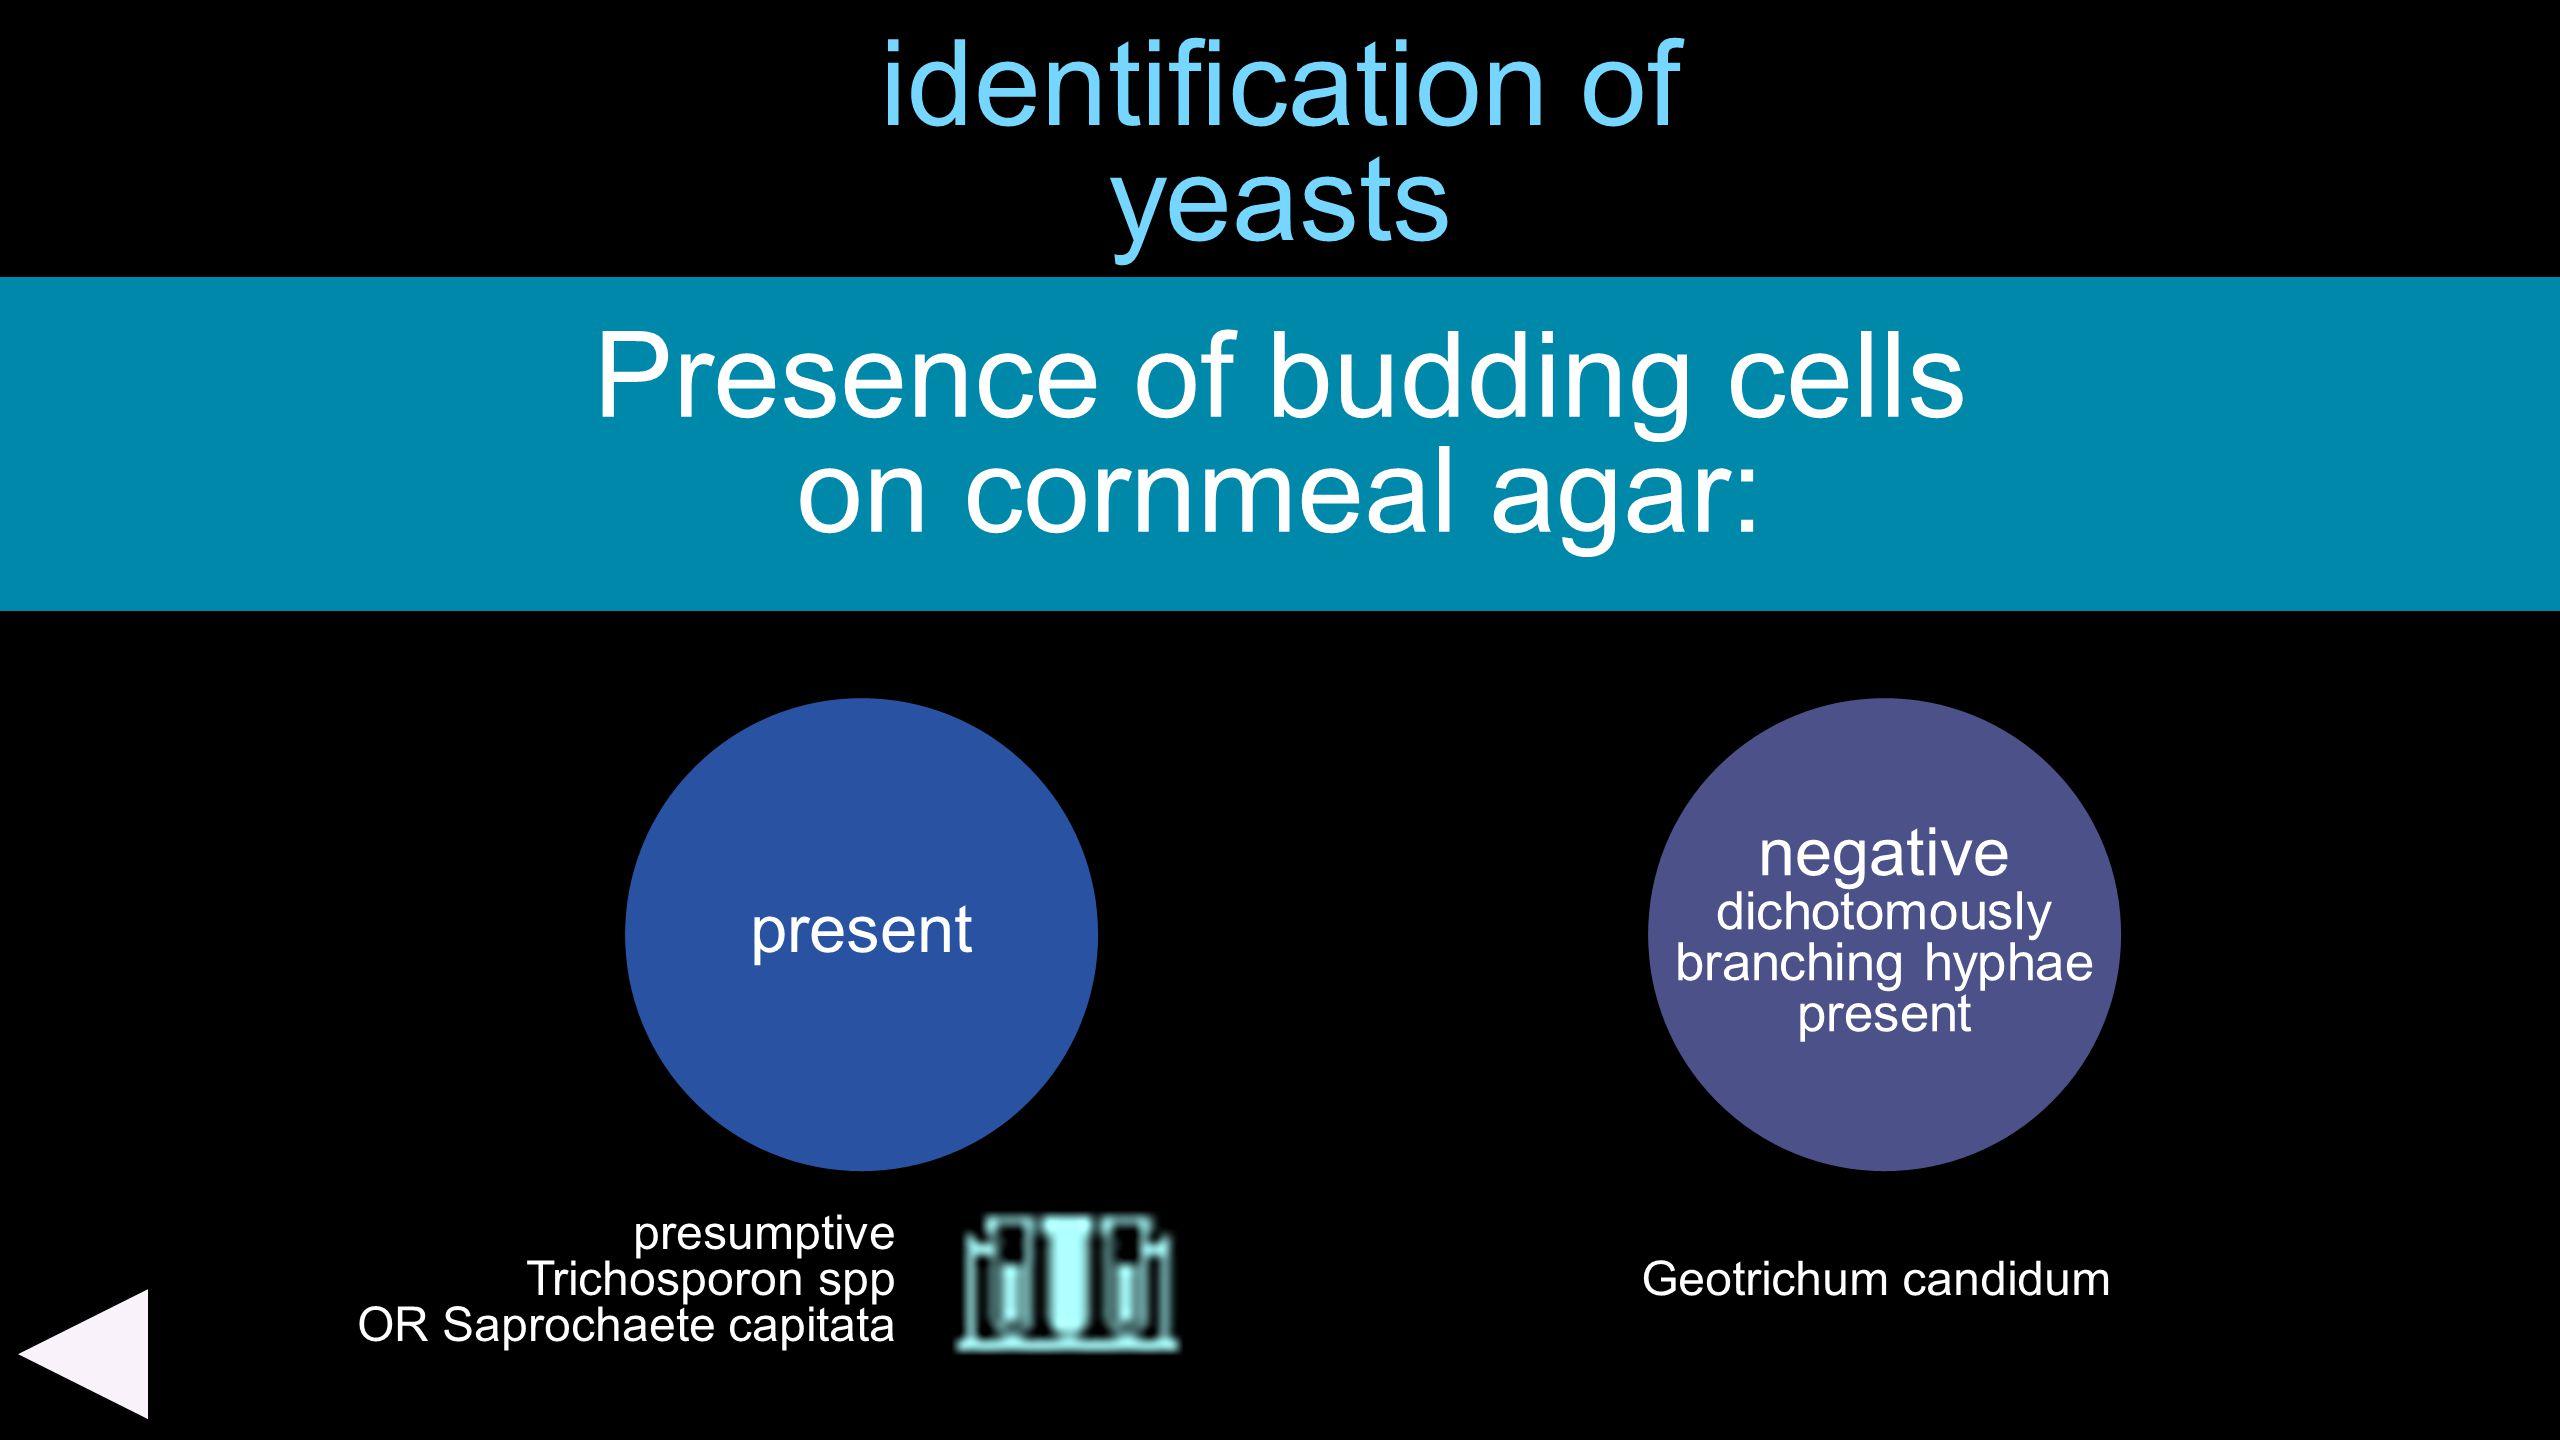 identification of yeasts Presence of budding cells on cornmeal agar: present negative dichotomously branching hyphae present presumptive Trichosporon